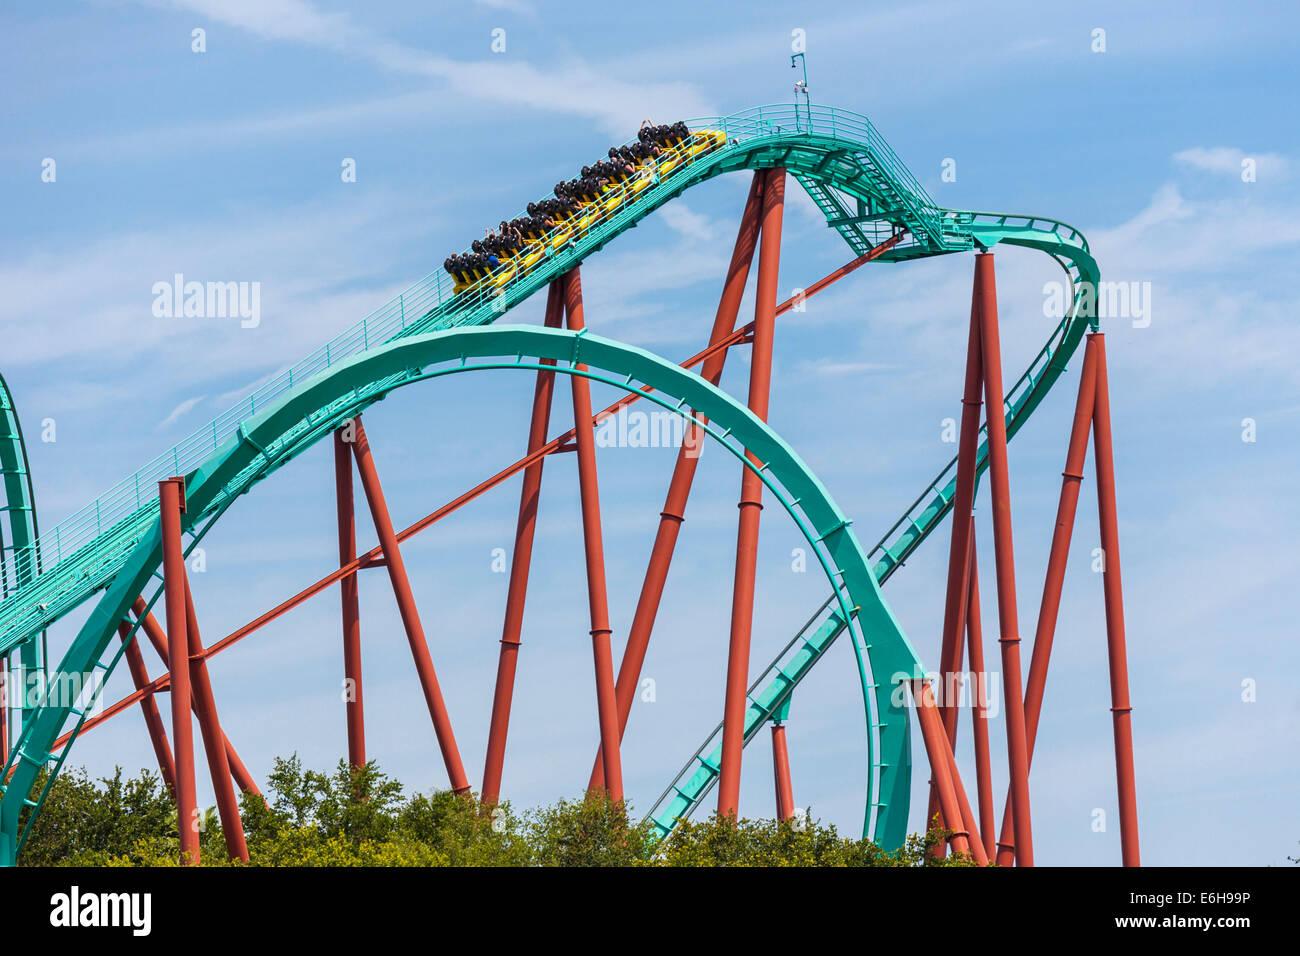 Kumba Roller Coaster At Busch Gardens Theme Park In Tampa Florida Stock Photo 72909922 Alamy